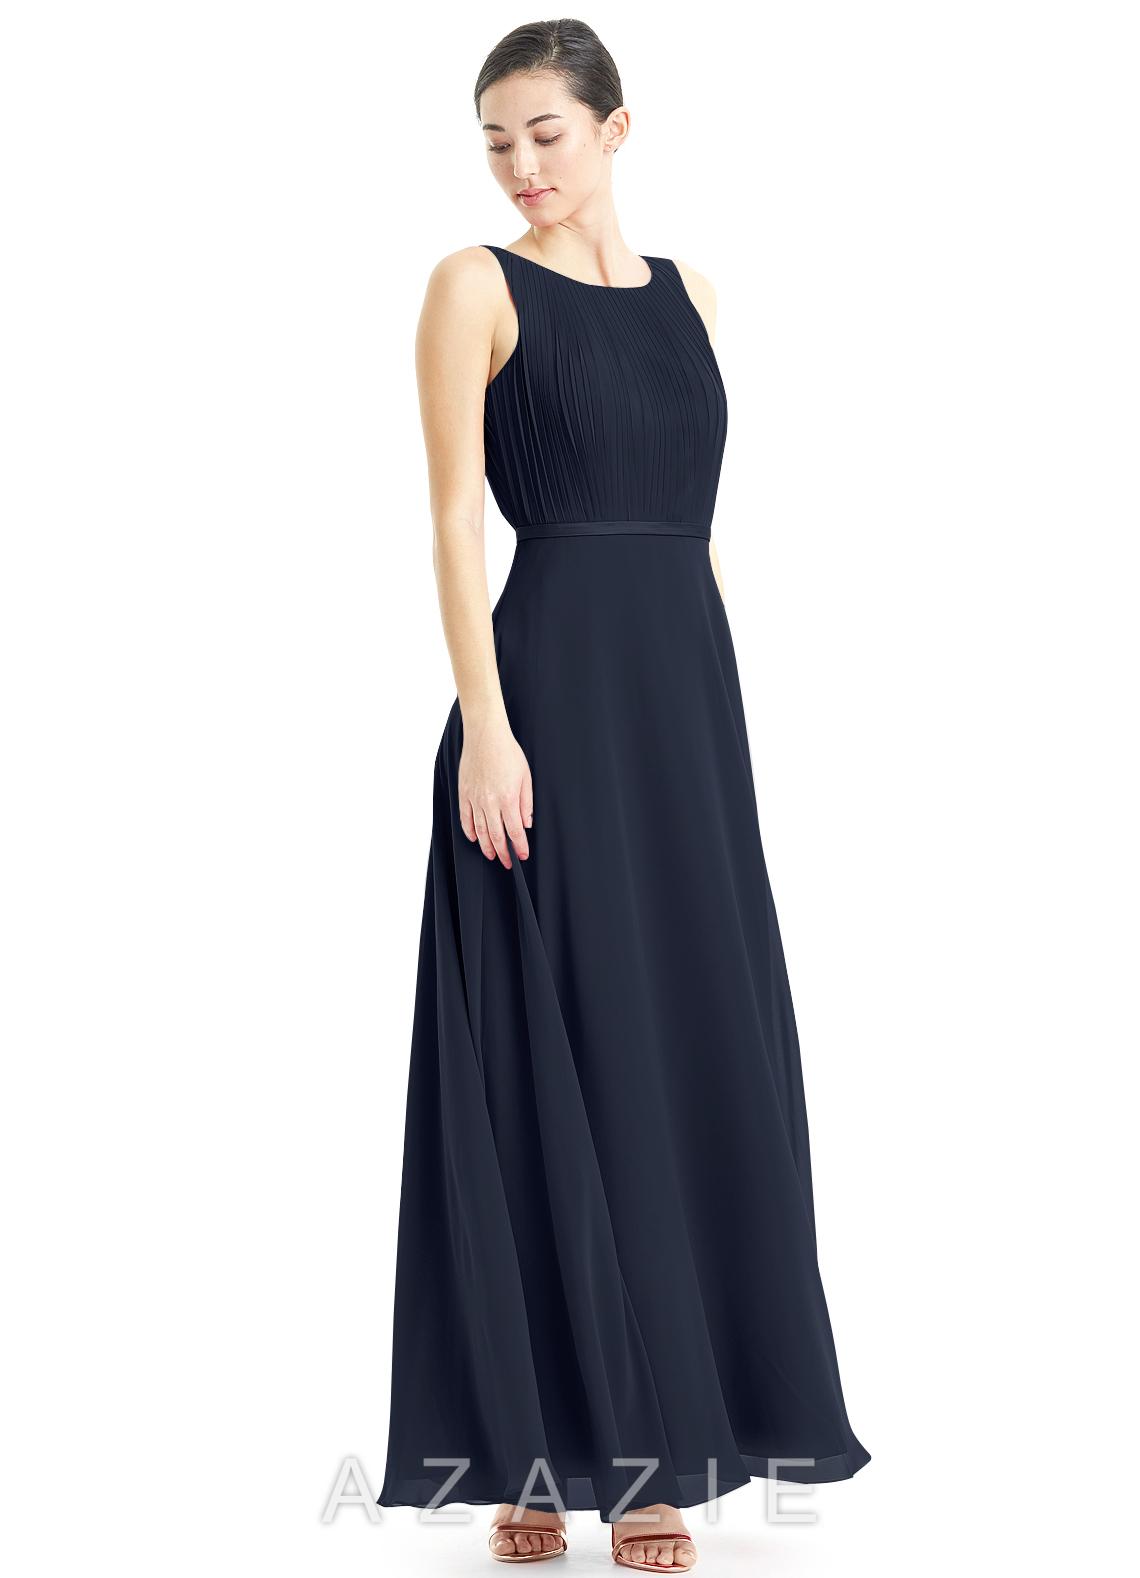 Azazie avery bridesmaid dress azazie loading zoom ombrellifo Choice Image